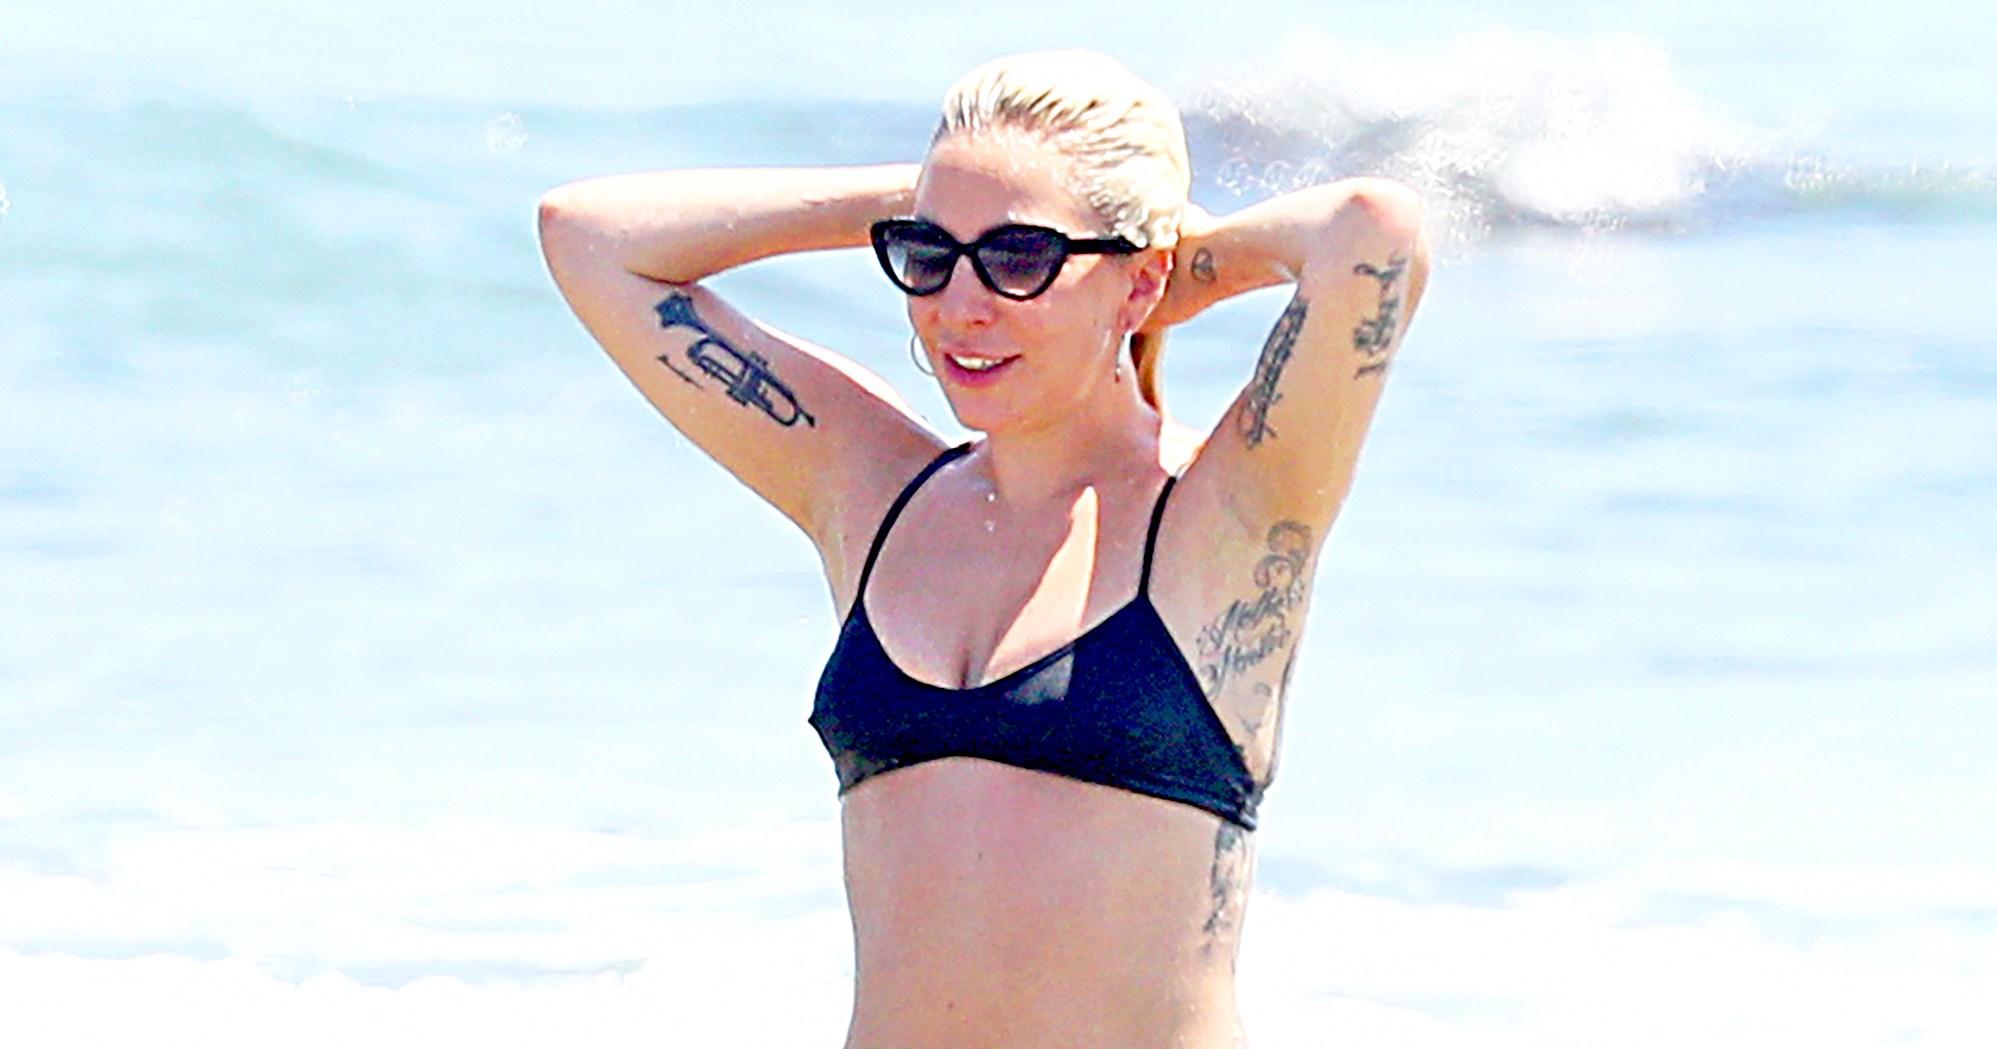 Improbable. Lady gaga tiny bikini